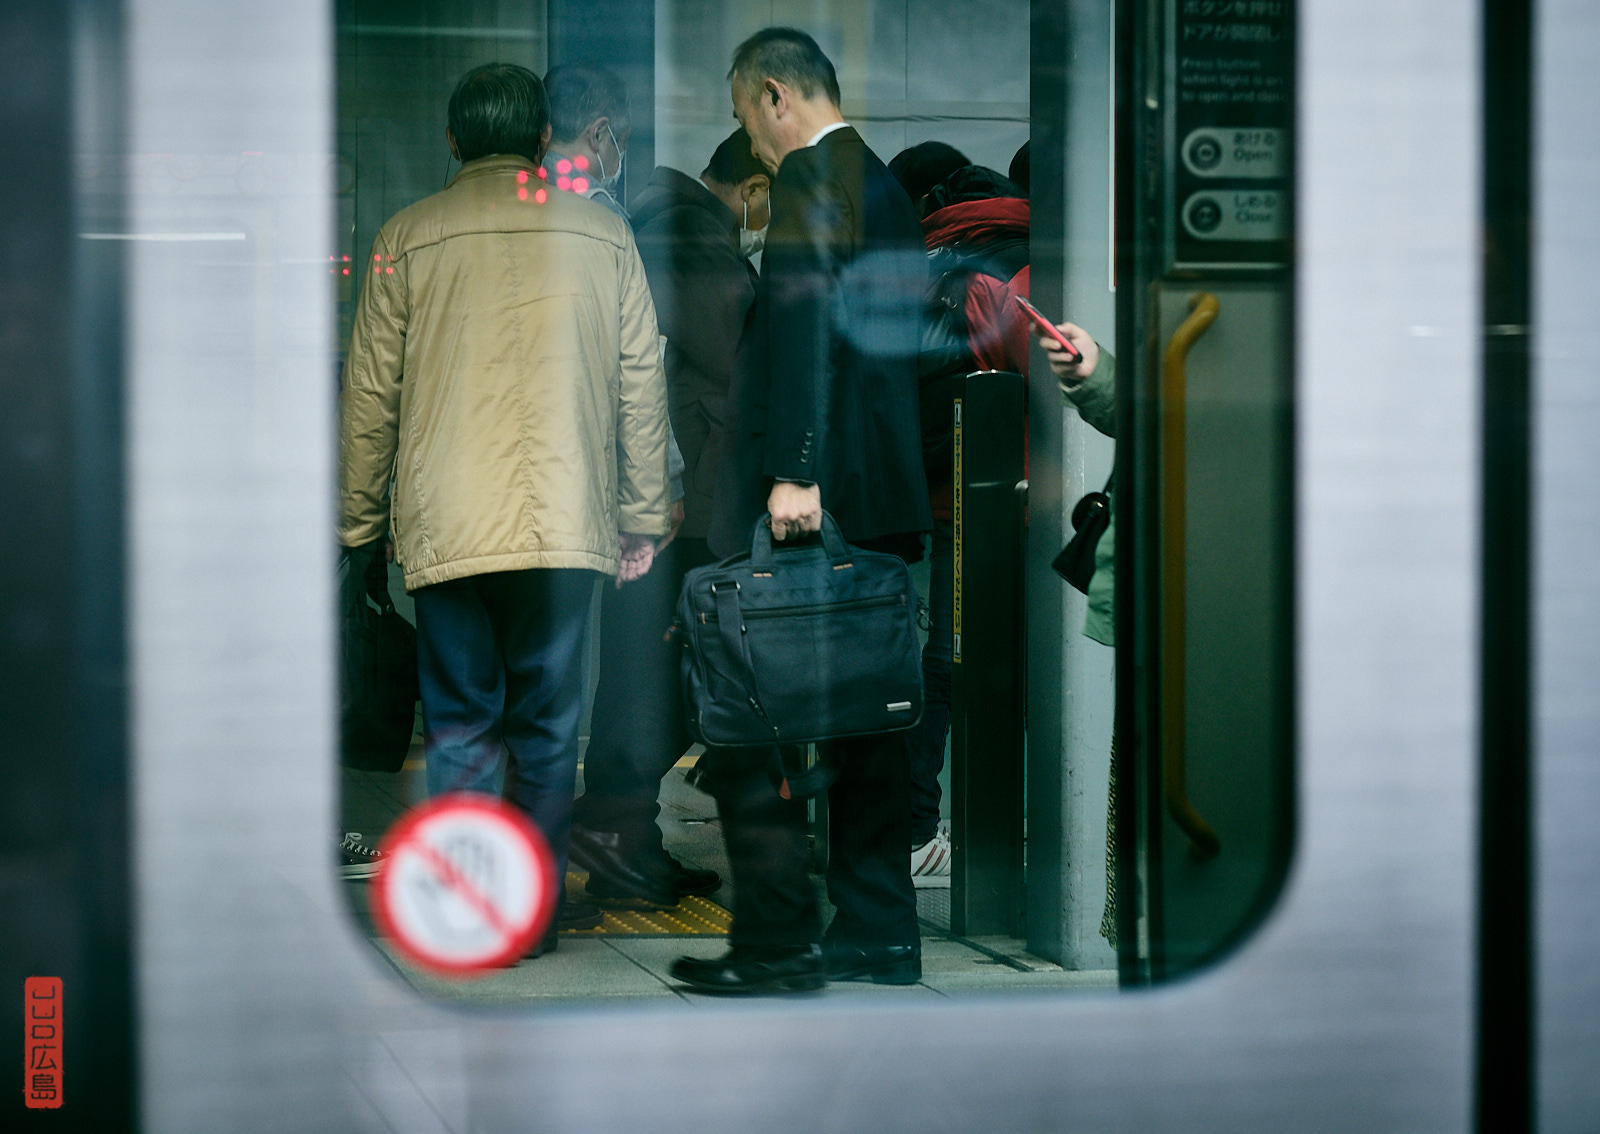 Homme d'affaire, Gare d'Hiroshima, mars 2020